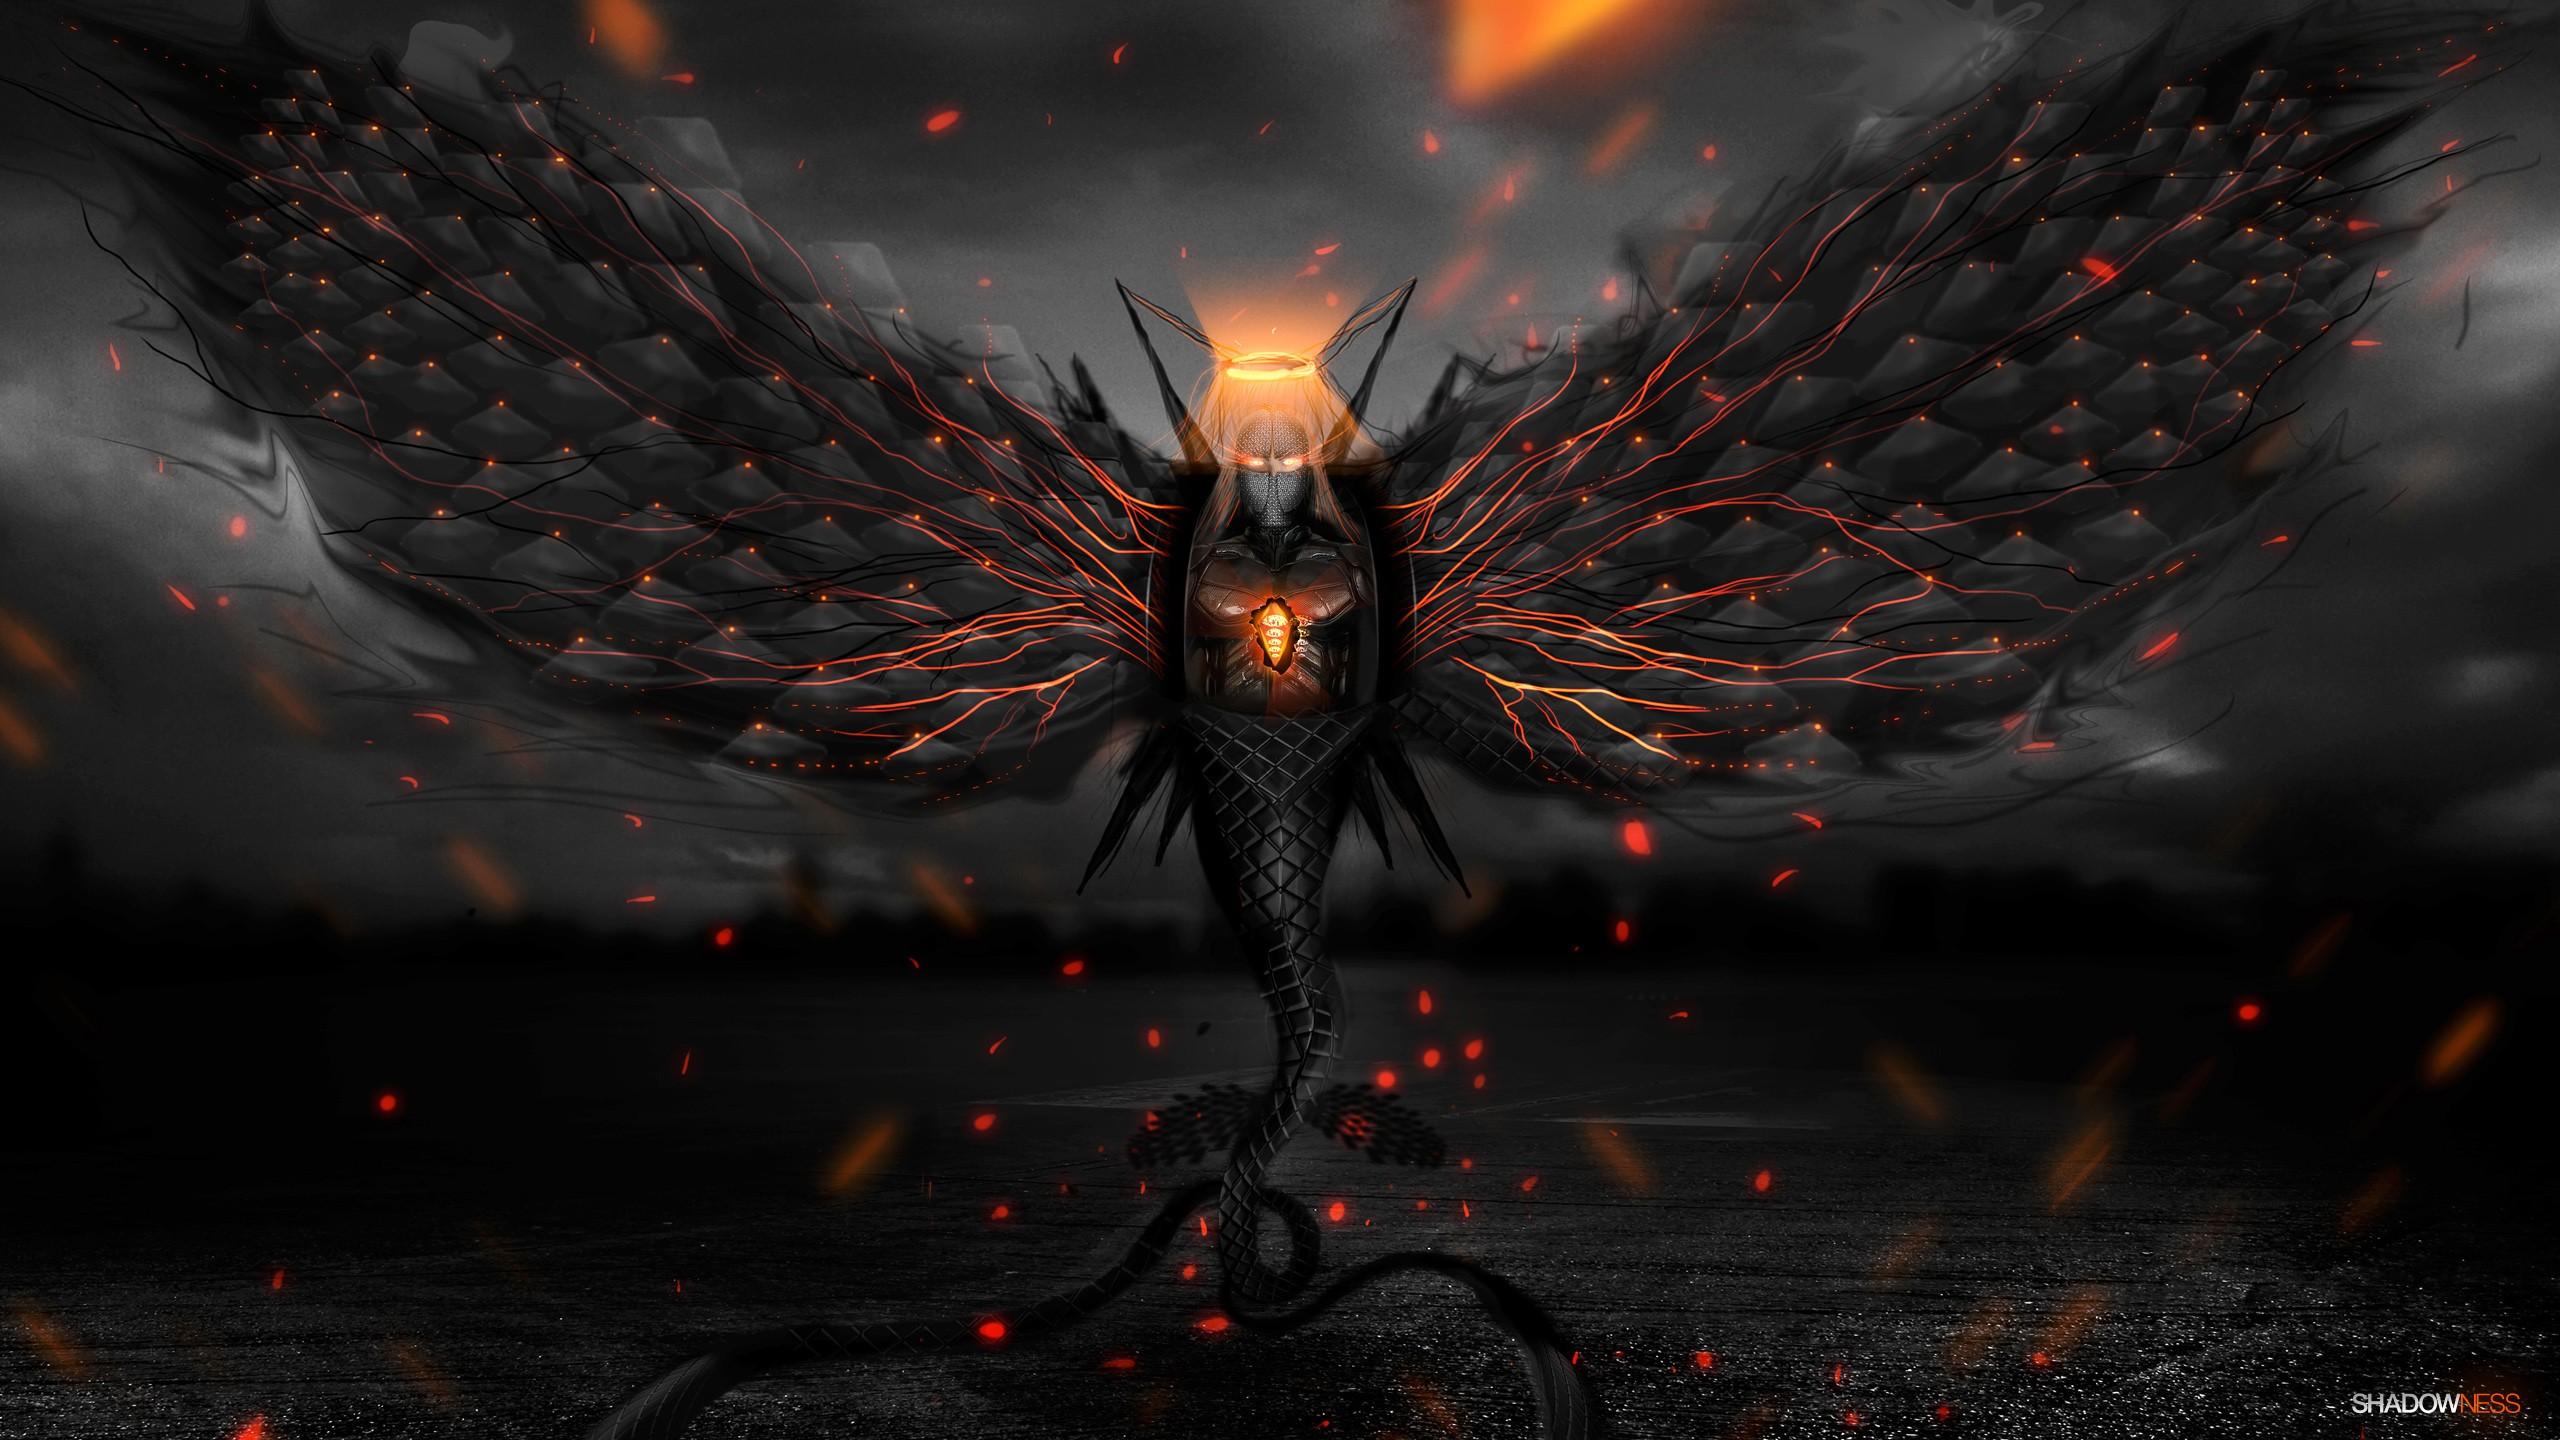 demon Wallpaper Background 20649 2560x1440